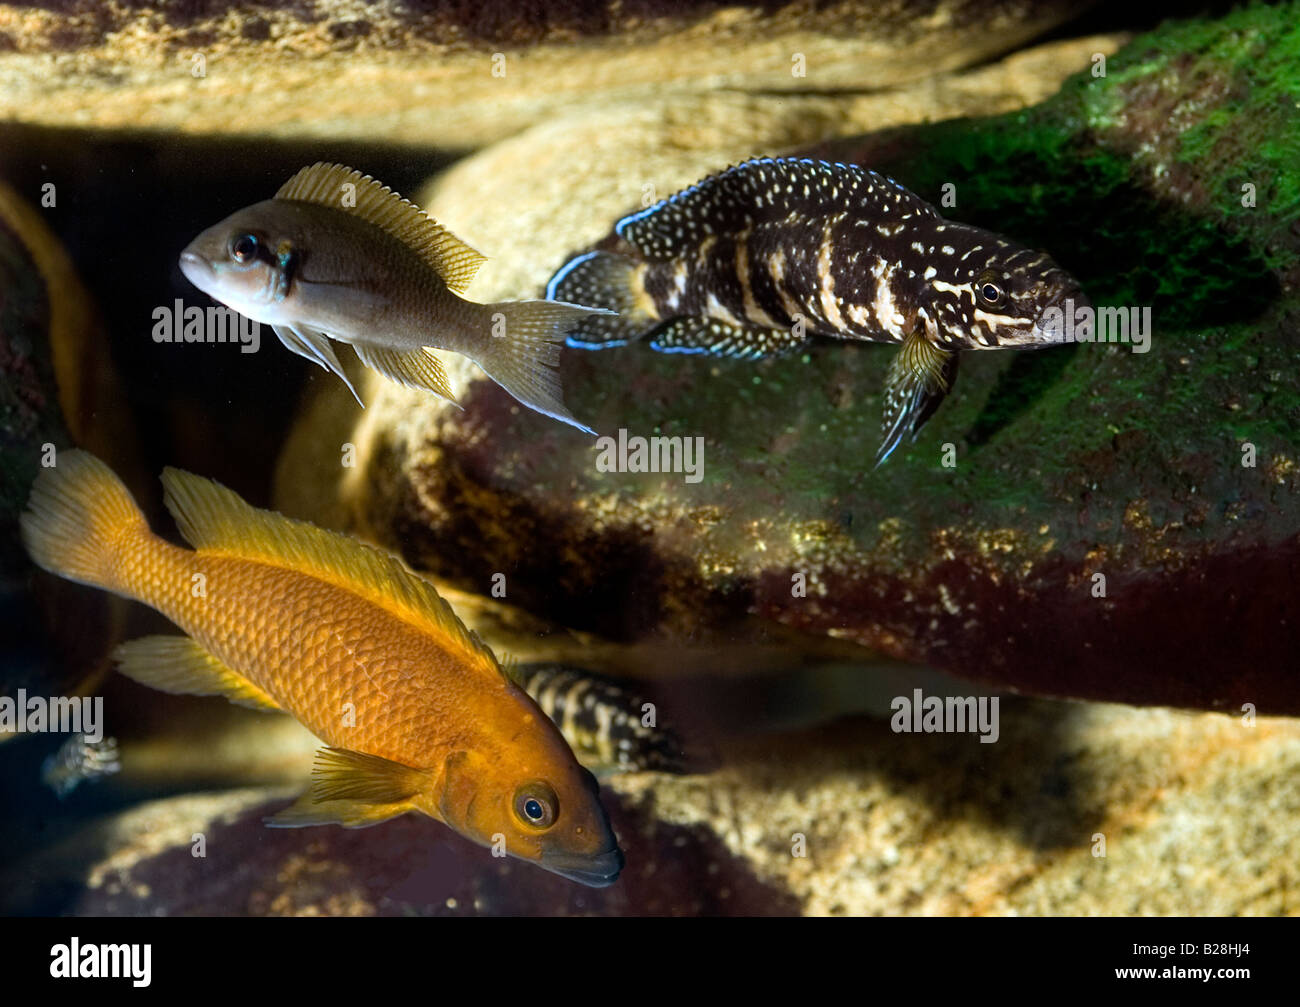 Freshwater aquarium fish gobiidae - Tanganika Lake Biotope Aquarium Freshwater Cichlid Of Tanganika Lake Africa Stock Image